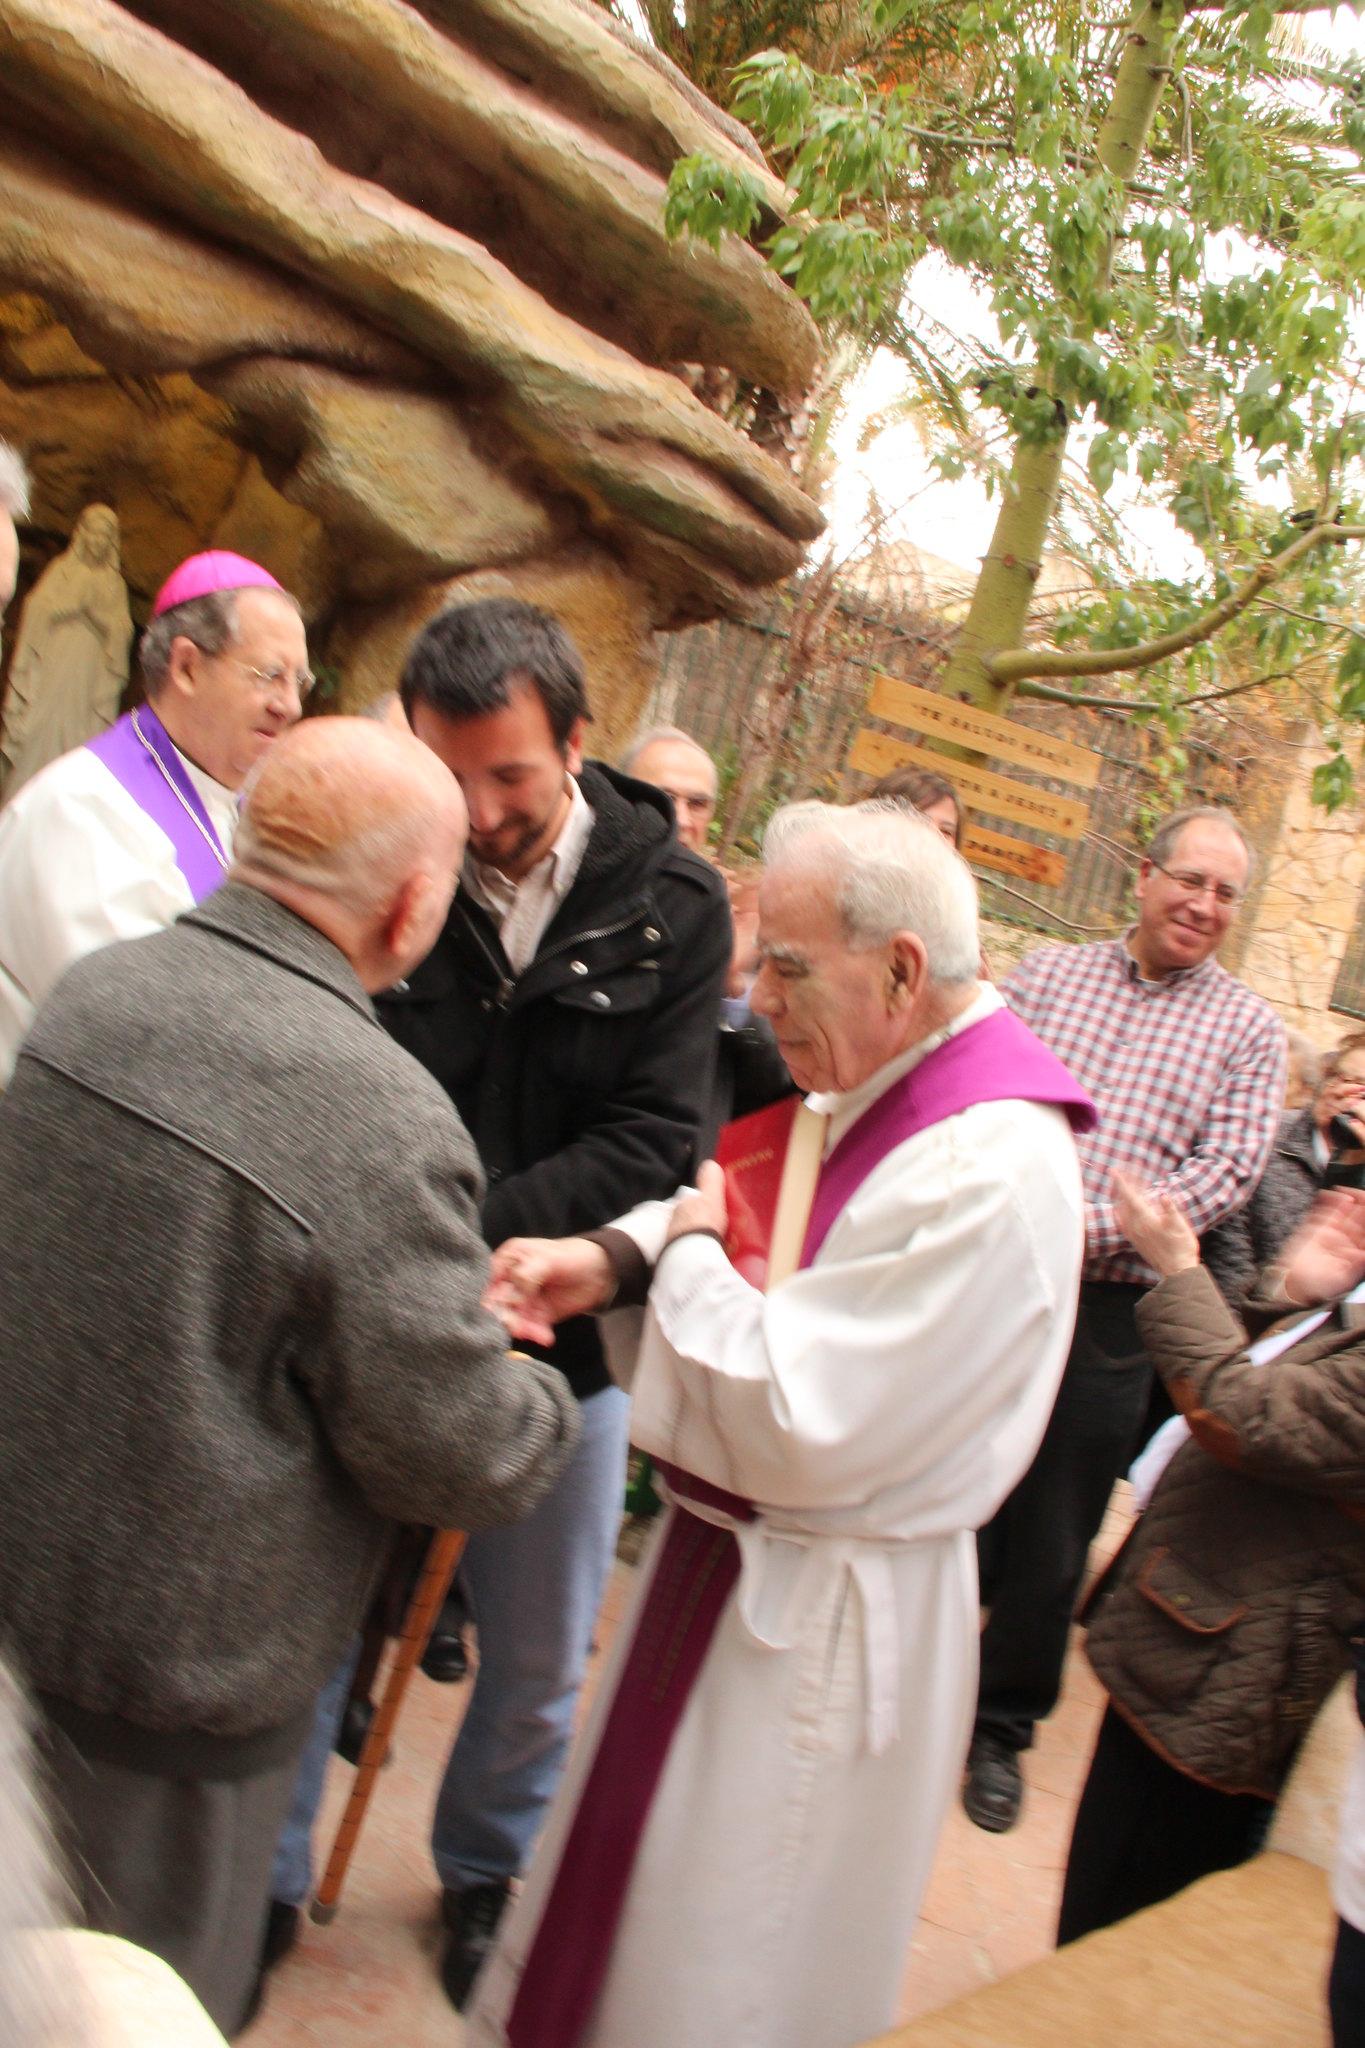 (2016-02-13) - Inauguración Virgen De Lourdes, La Molineta - Archivo La Molineta (089)